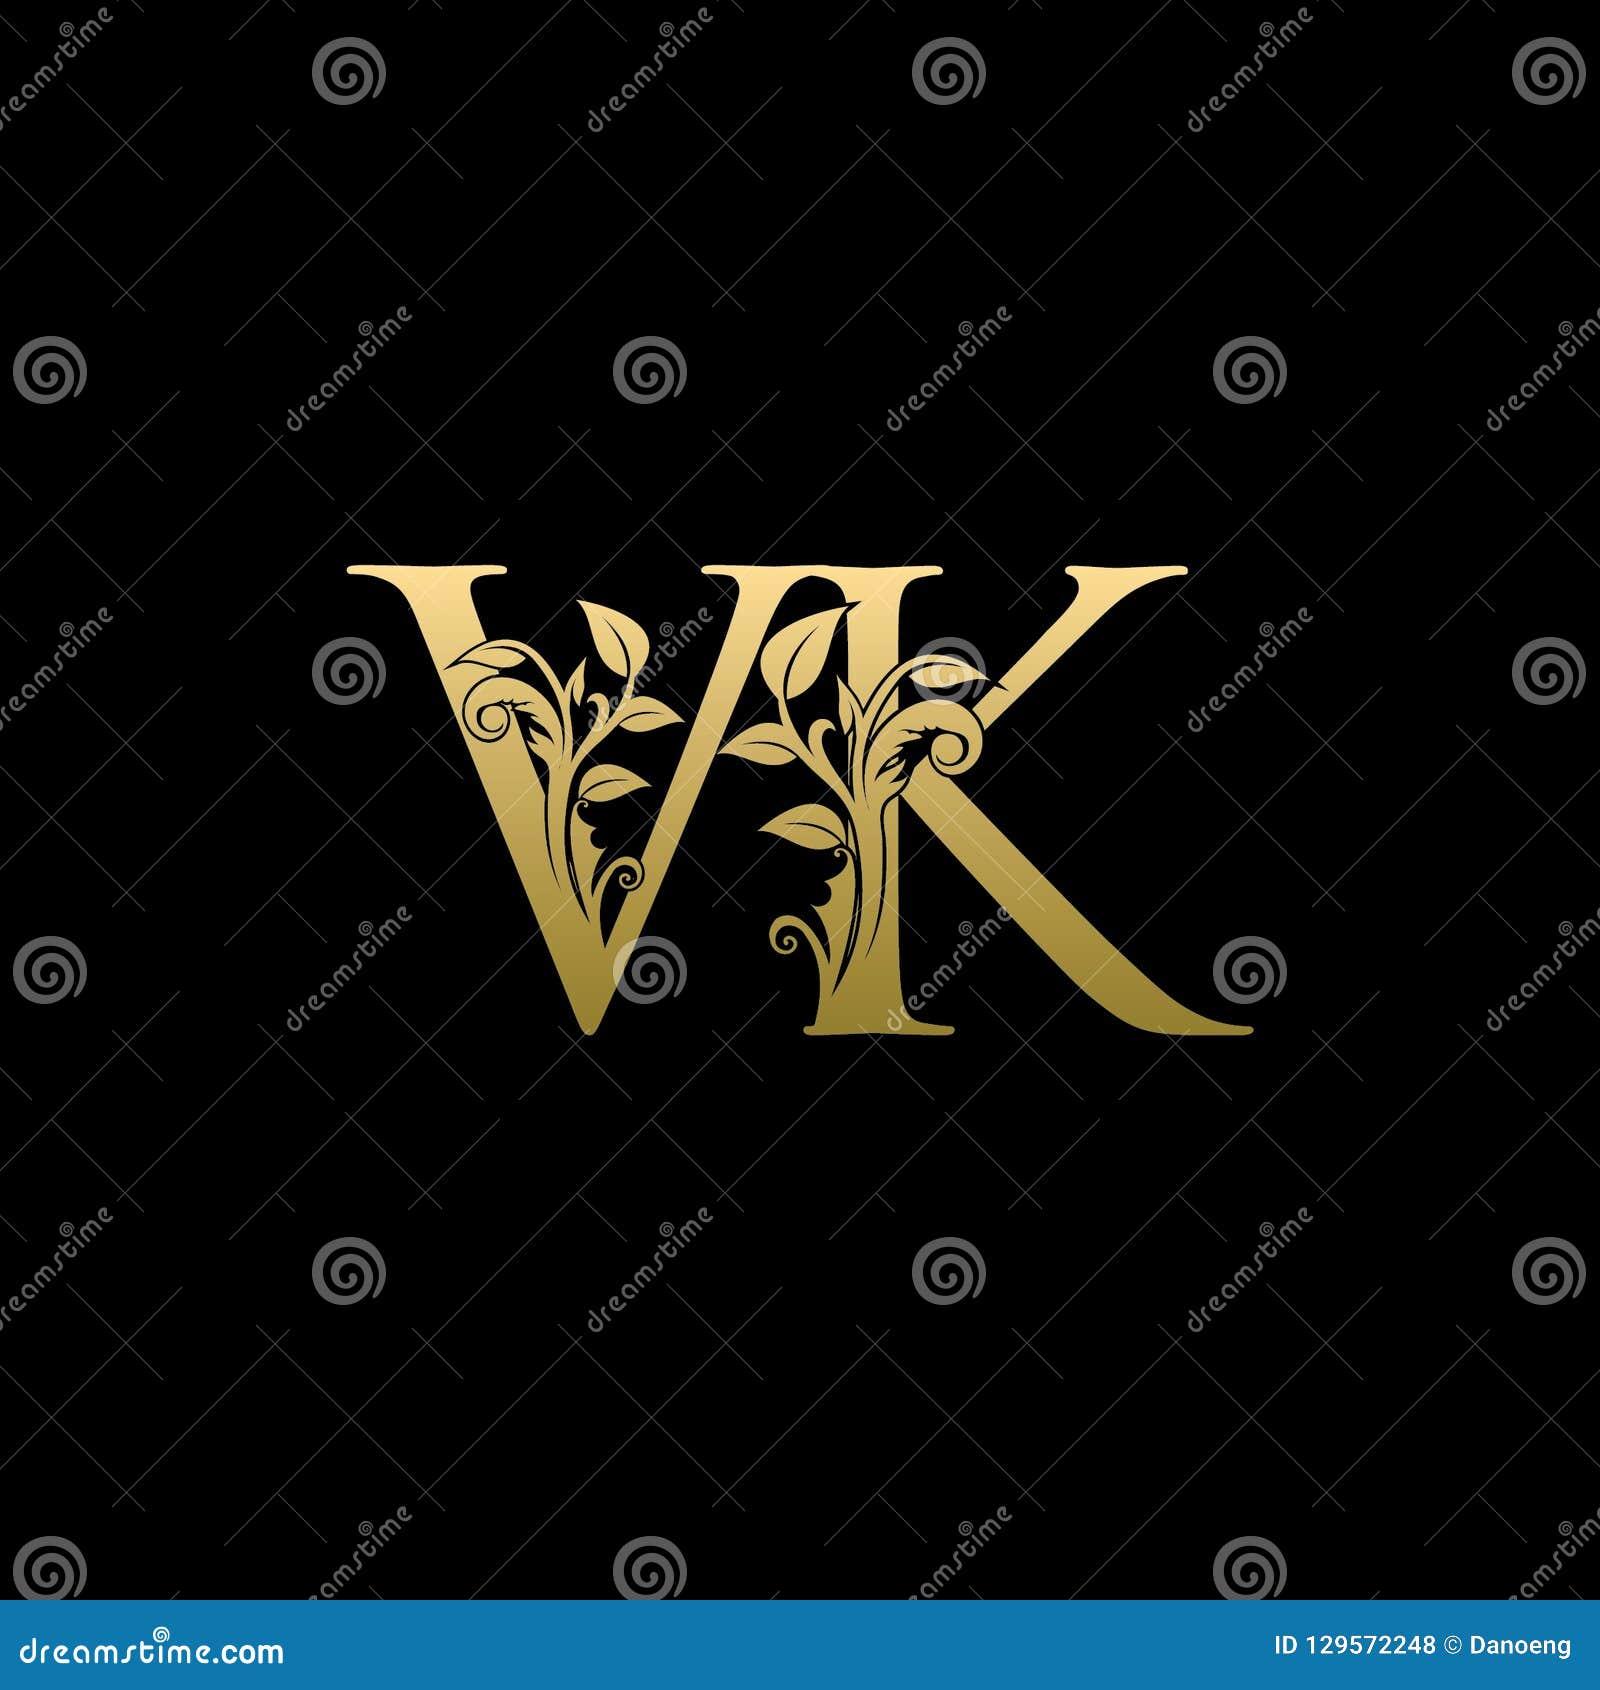 Classy Gold Leaf VK Letter Logo Stock Illustration